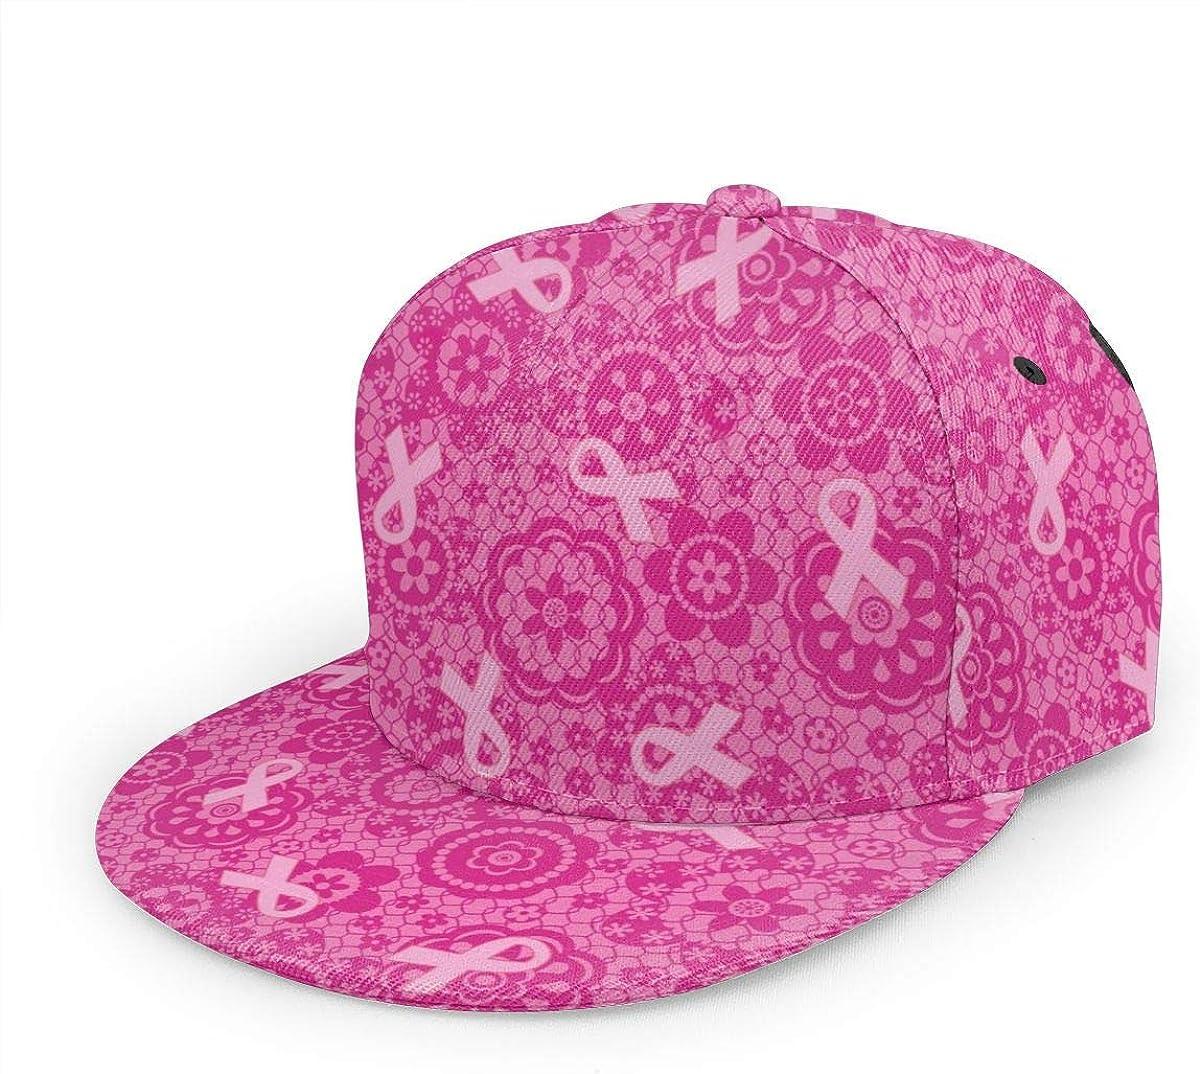 Pink Ribbon Lightweight Unisex Baseball Caps Adjustable Breathable Sun Hat for Sport Outdoor